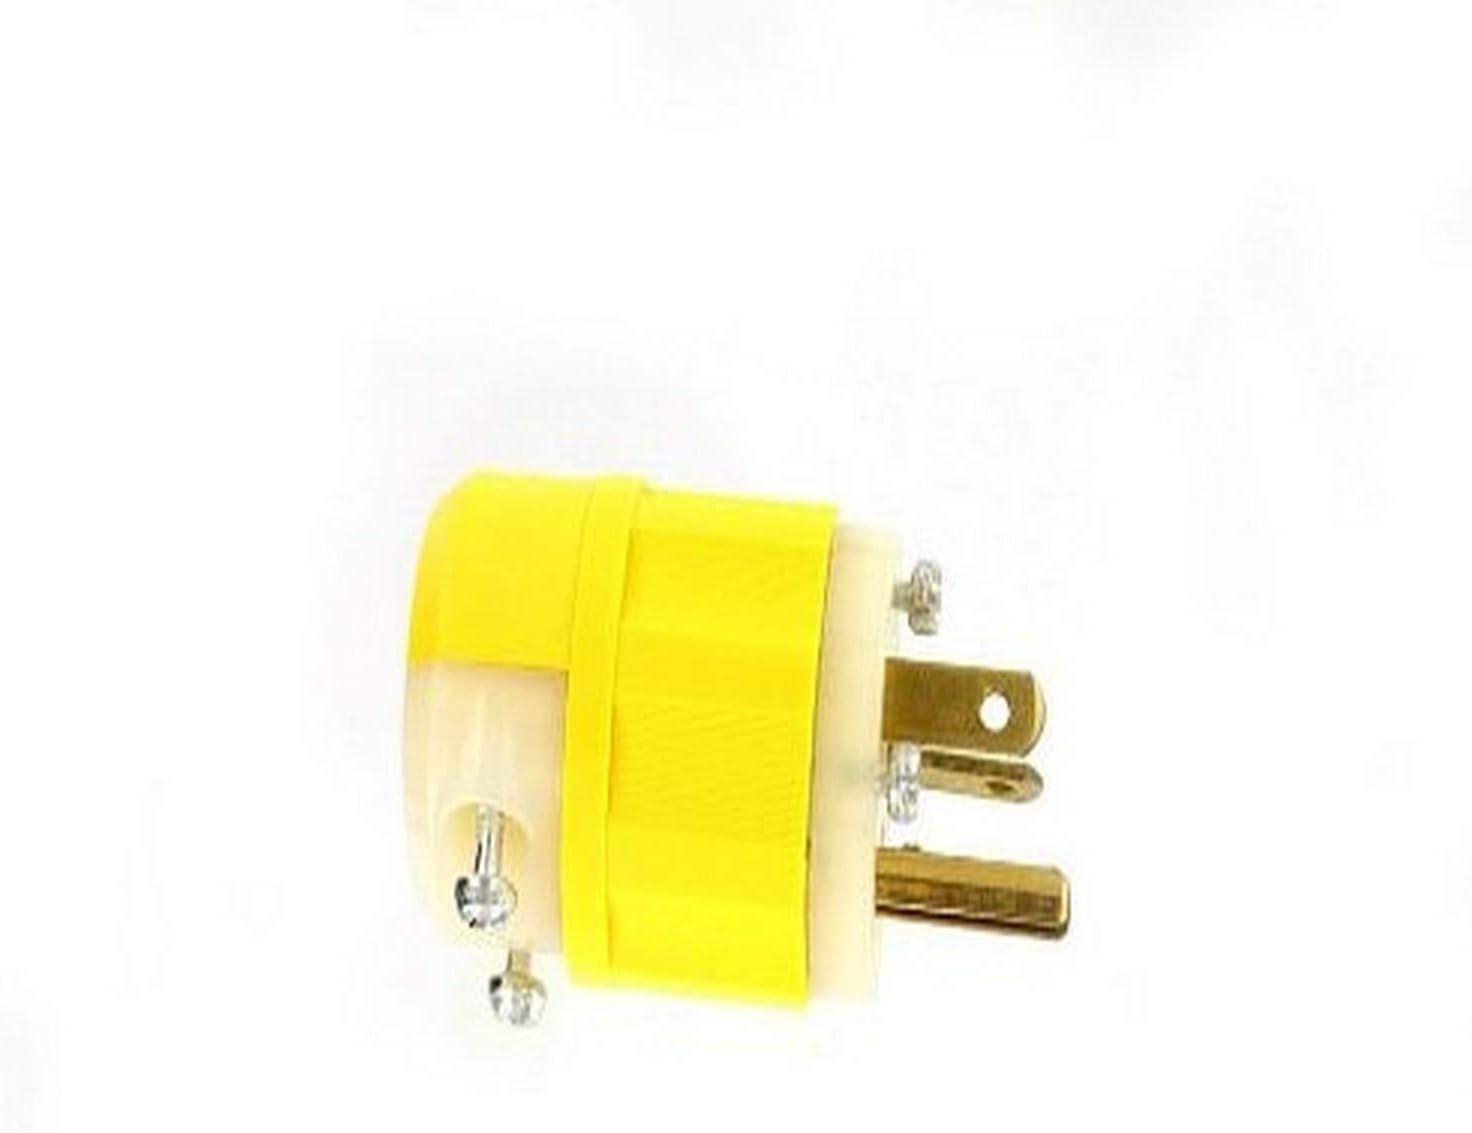 125 Volt Straight Blade Plug Leviton 5366-C 20 Amp Industrial Grade,